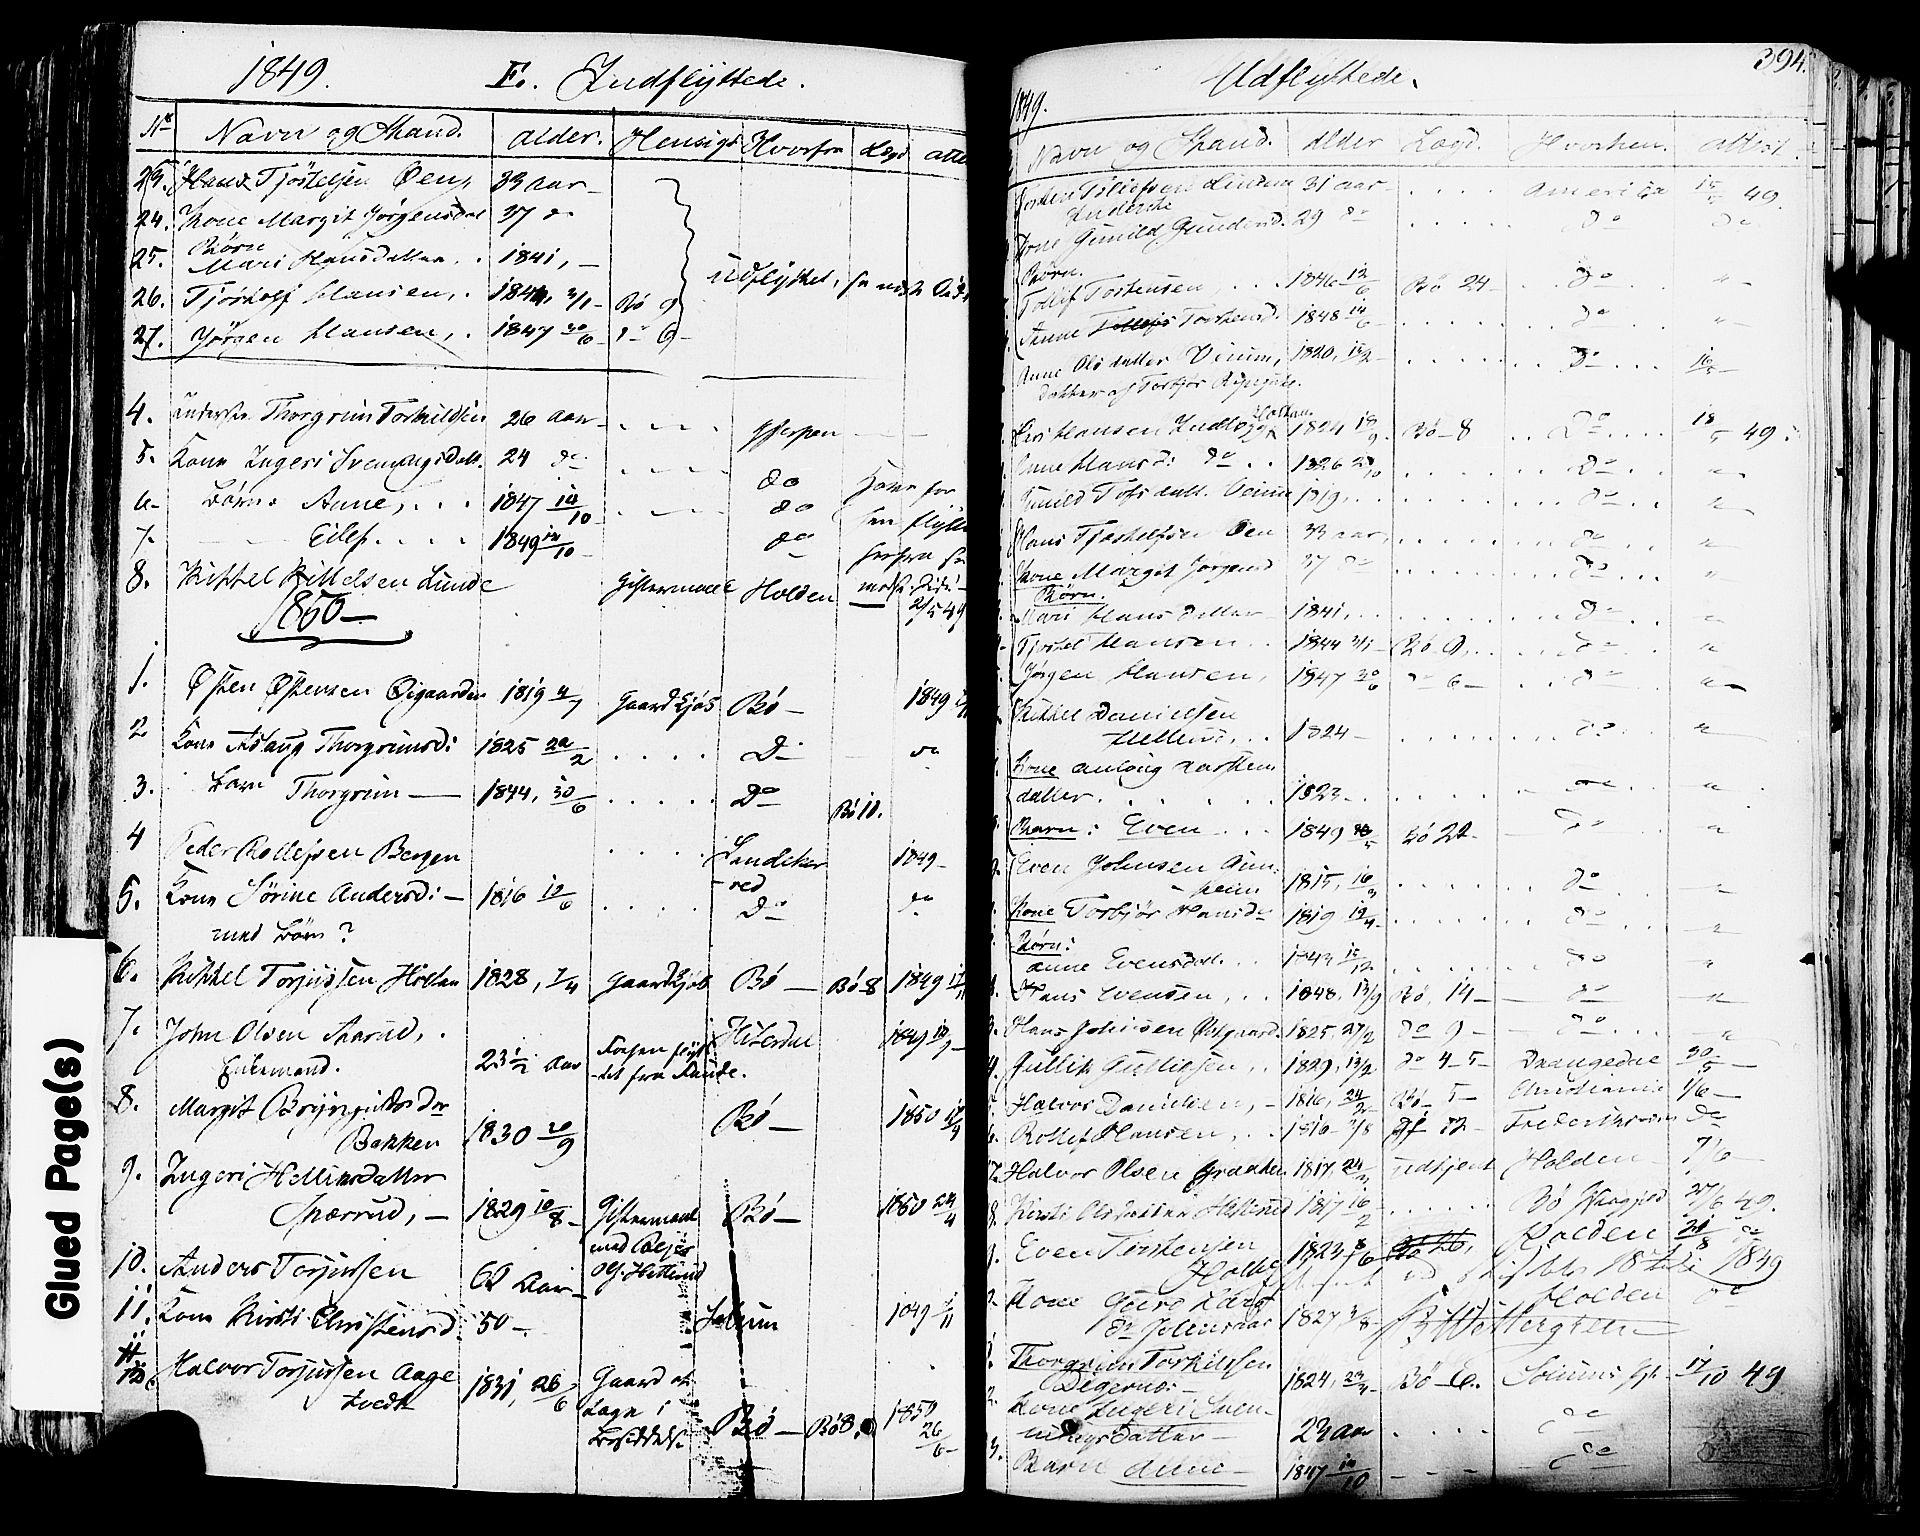 SAKO, Sauherad kirkebøker, F/Fa/L0006: Ministerialbok nr. I 6, 1827-1850, s. 394